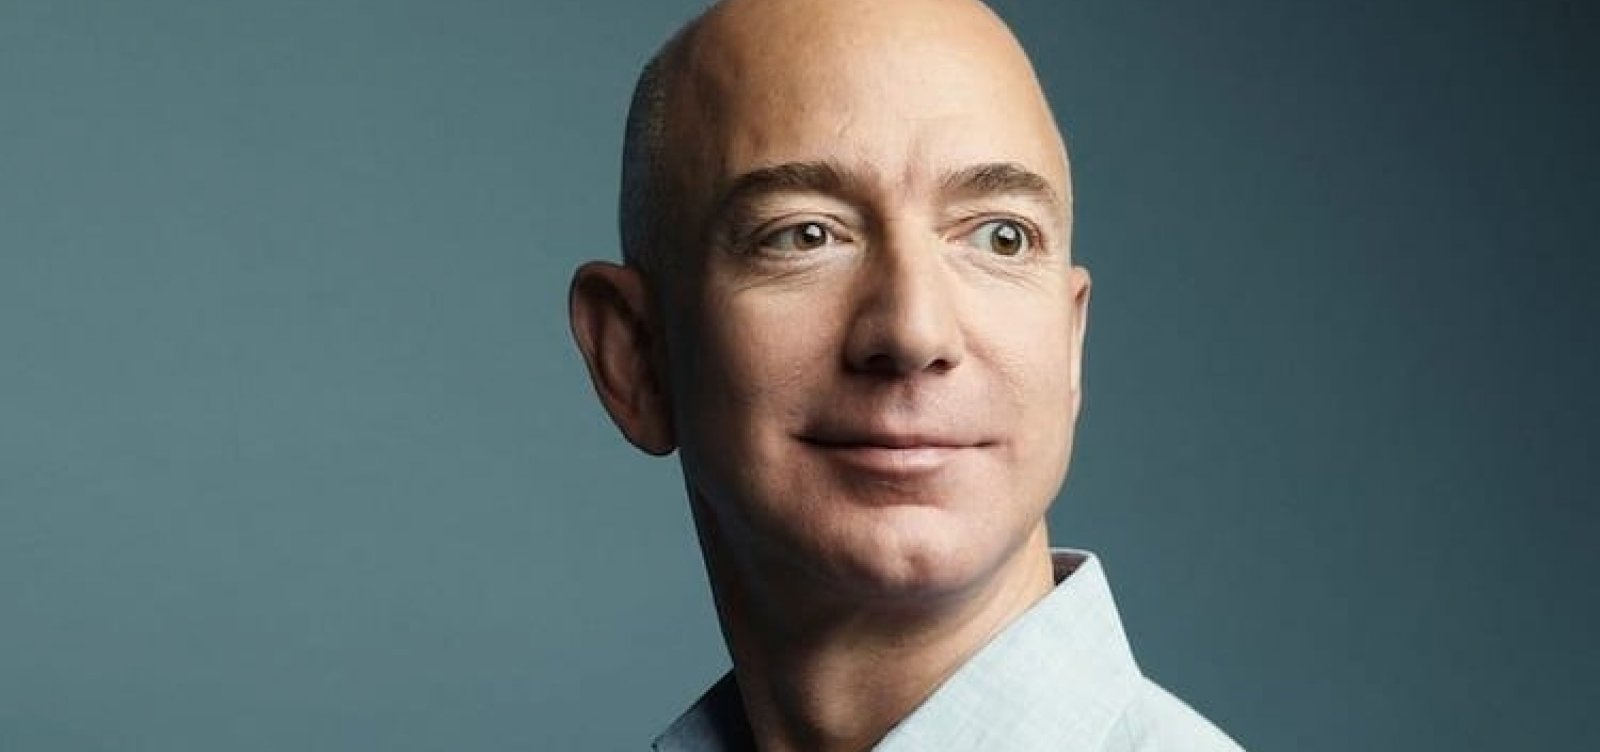 [Dono da Amazon supera Bill Gates e vira o mais rico nos EUA]